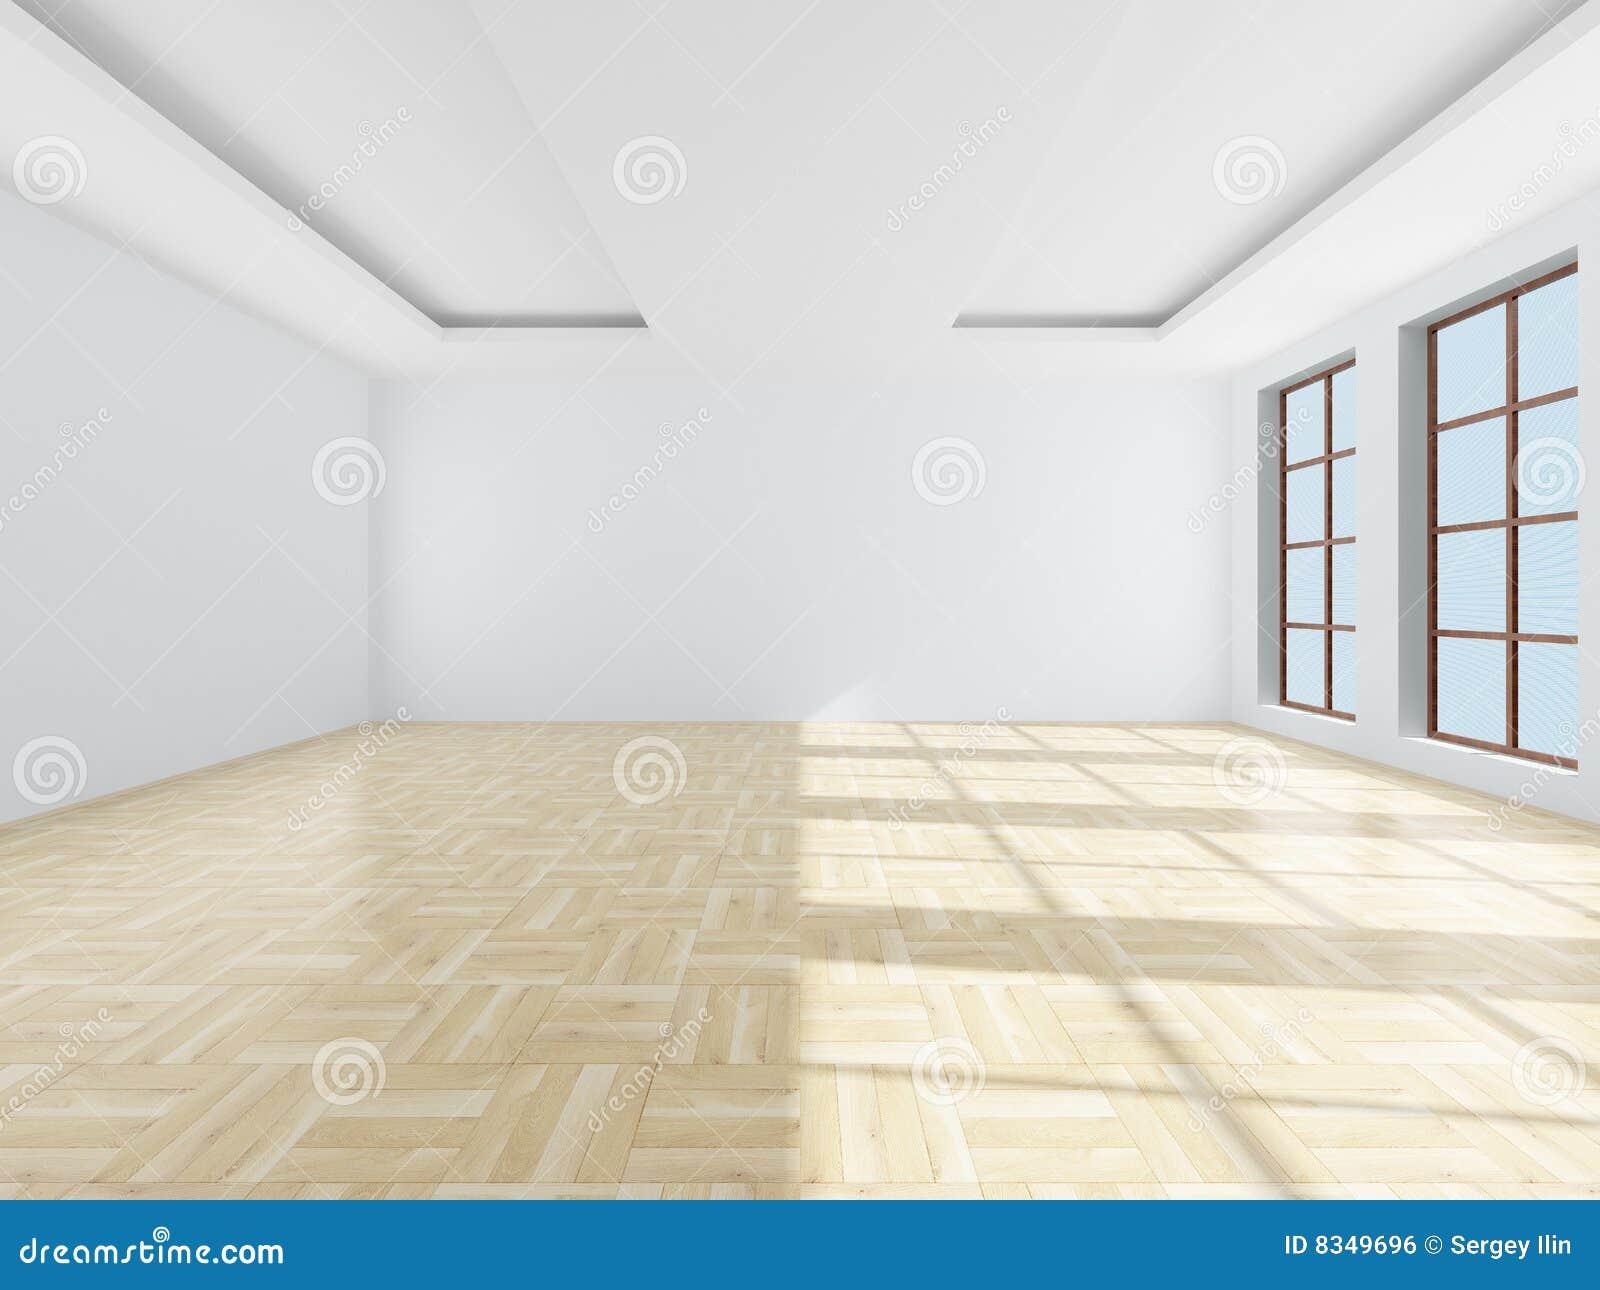 leerer raum bild 3d lizenzfreies stockbild bild 8349696. Black Bedroom Furniture Sets. Home Design Ideas